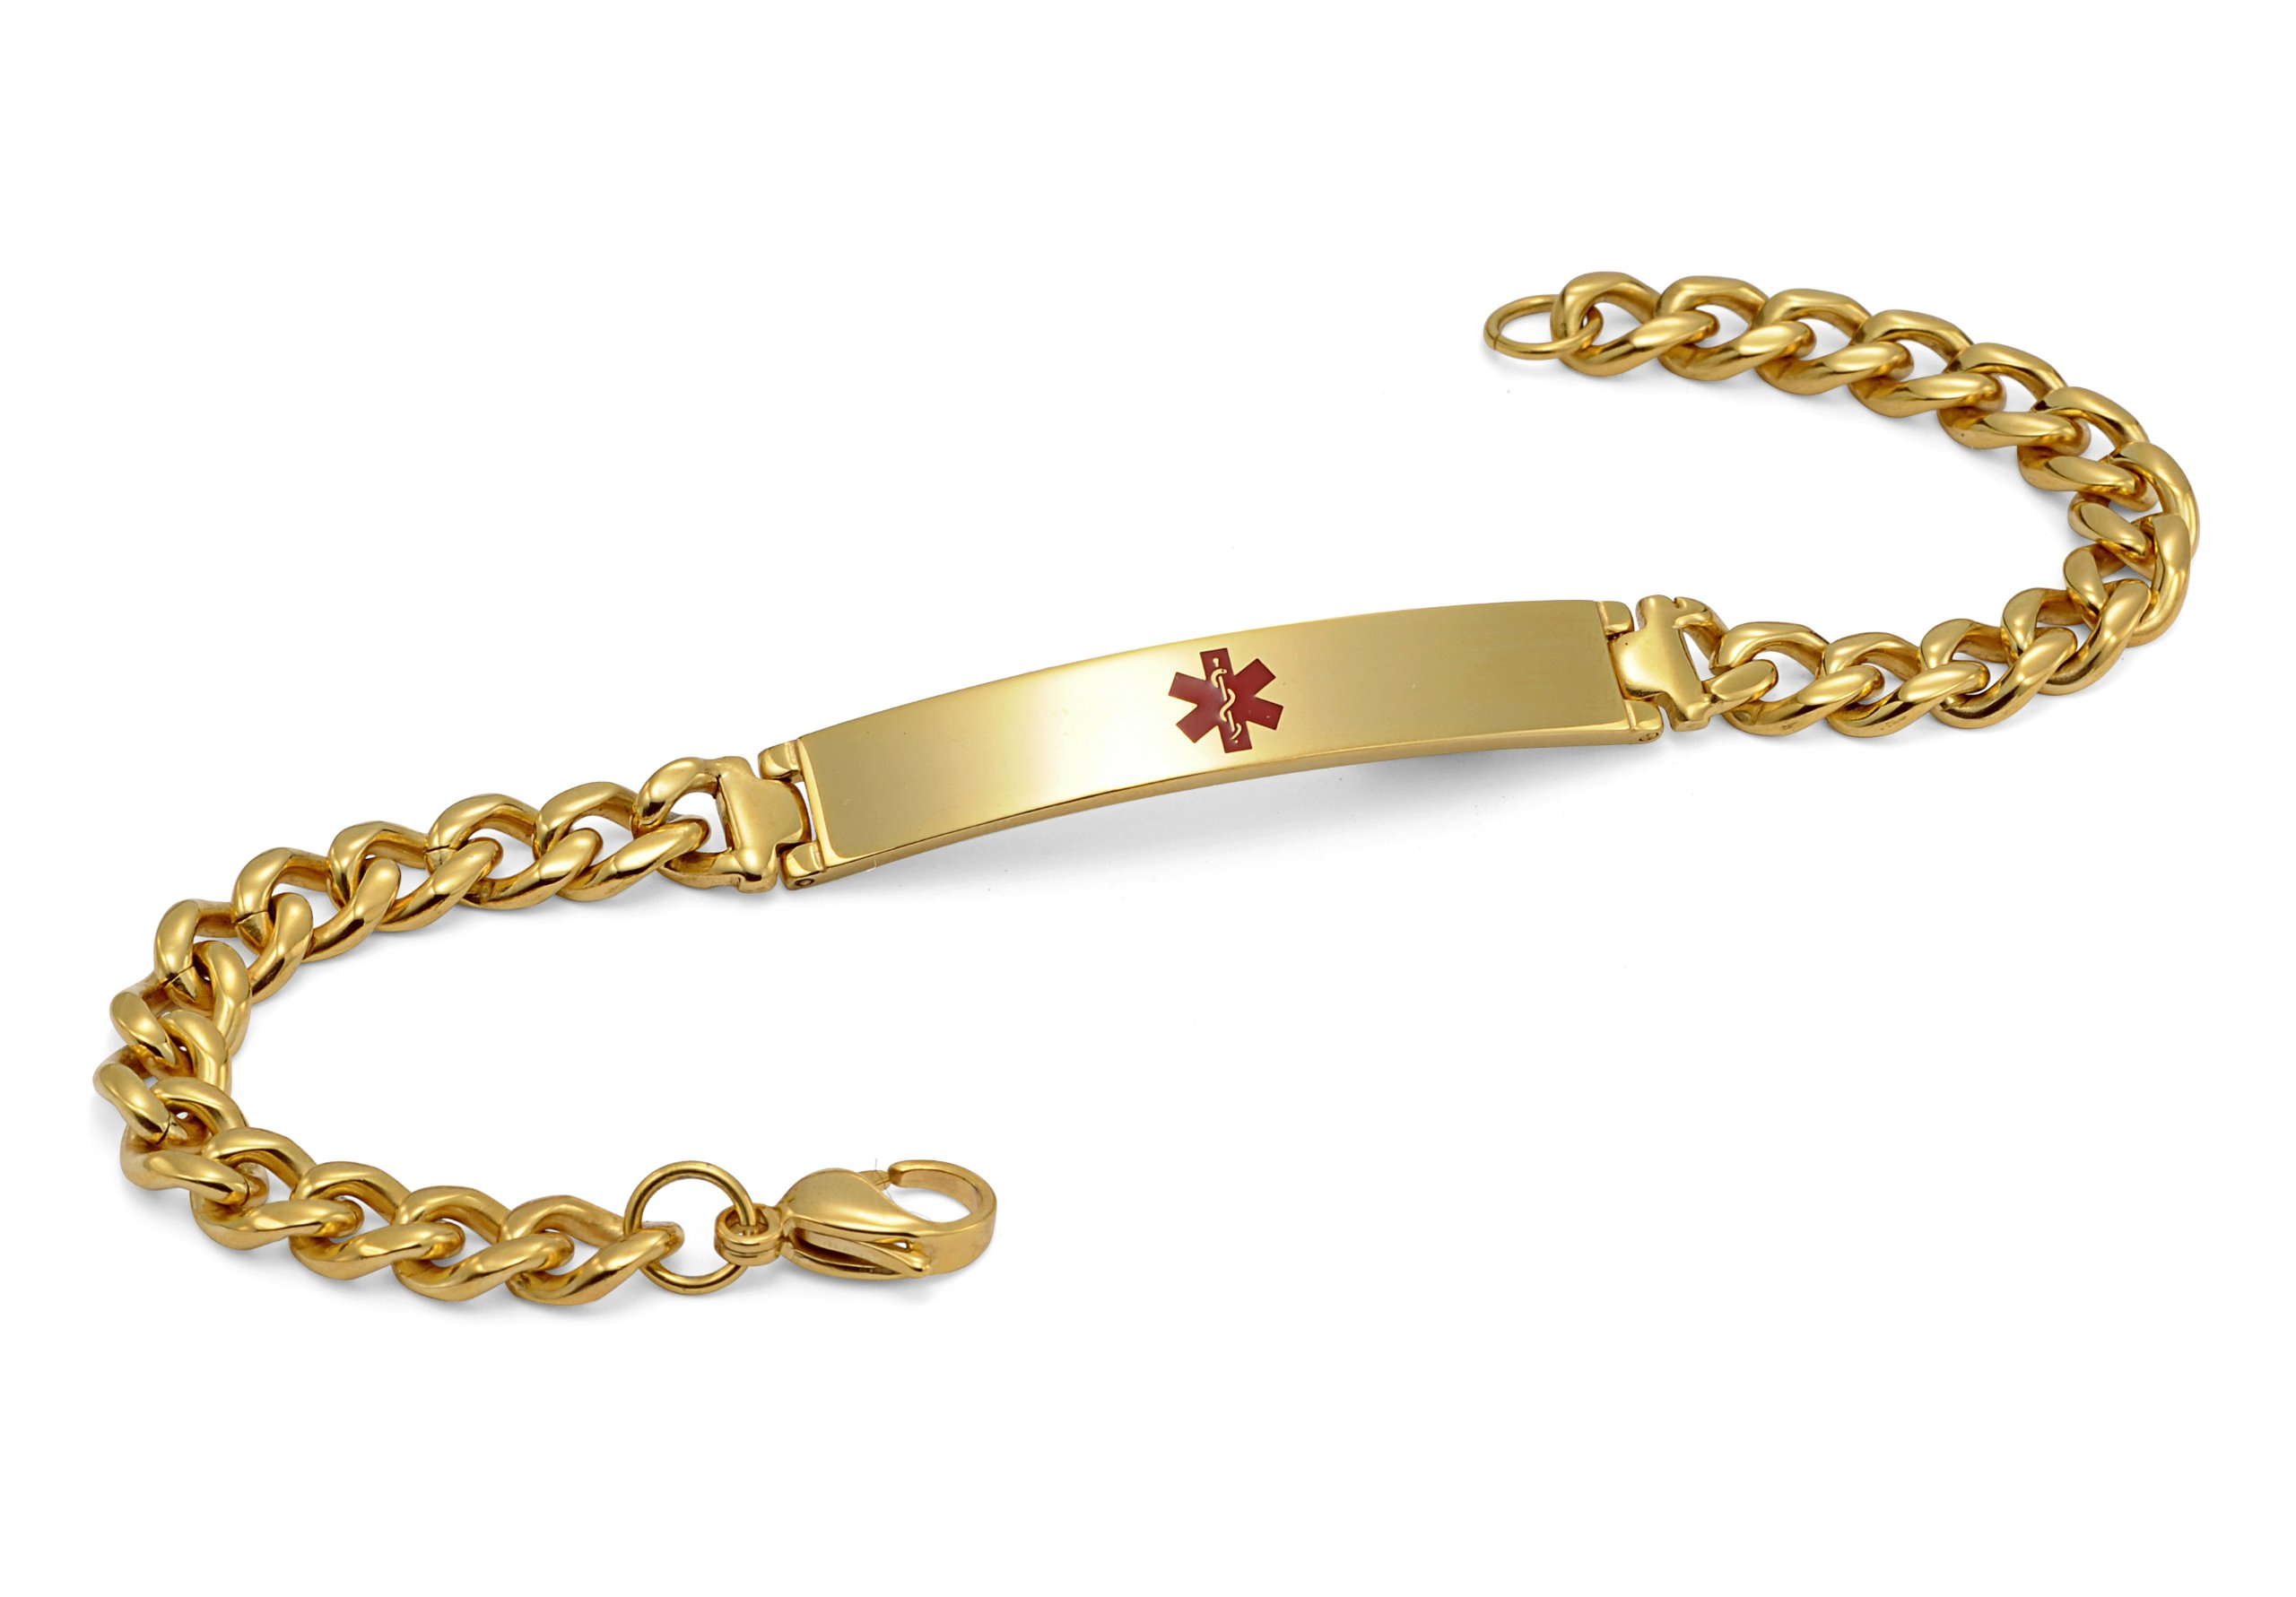 Gold Plated Bracelet - Medical ID (7)